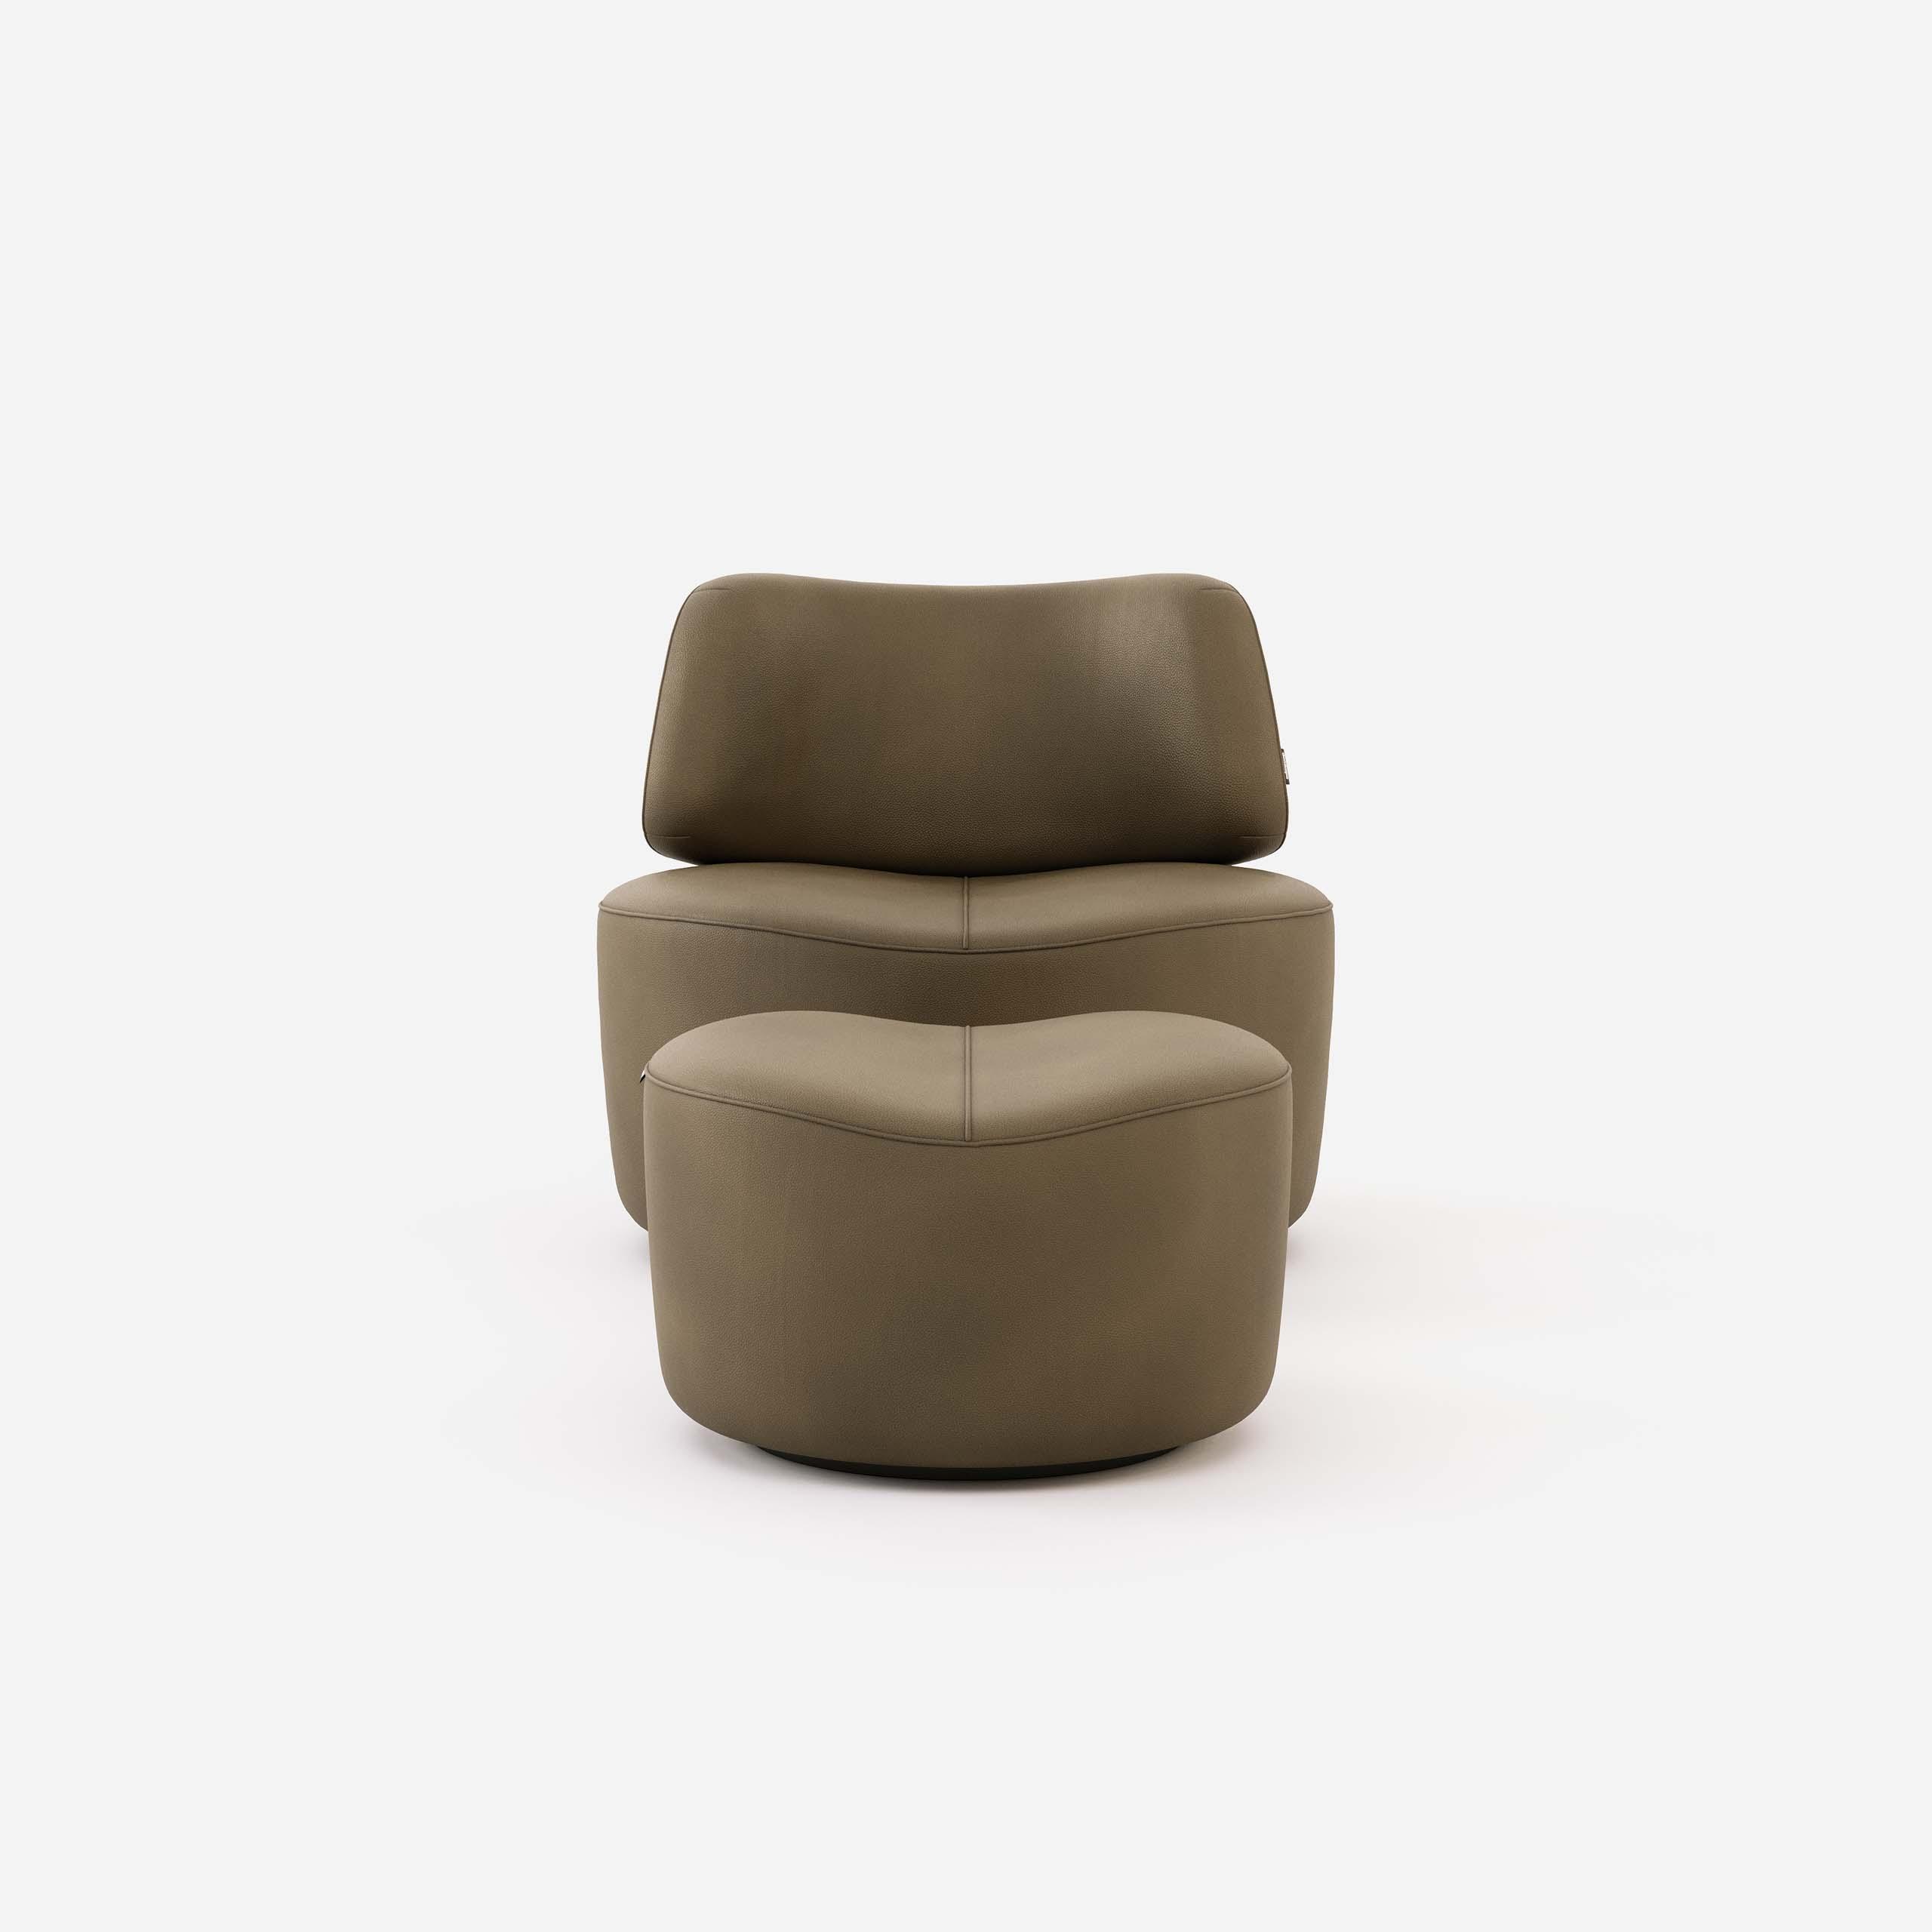 harmony-armchair-domkapa-new-collection-2021-living-room-decor